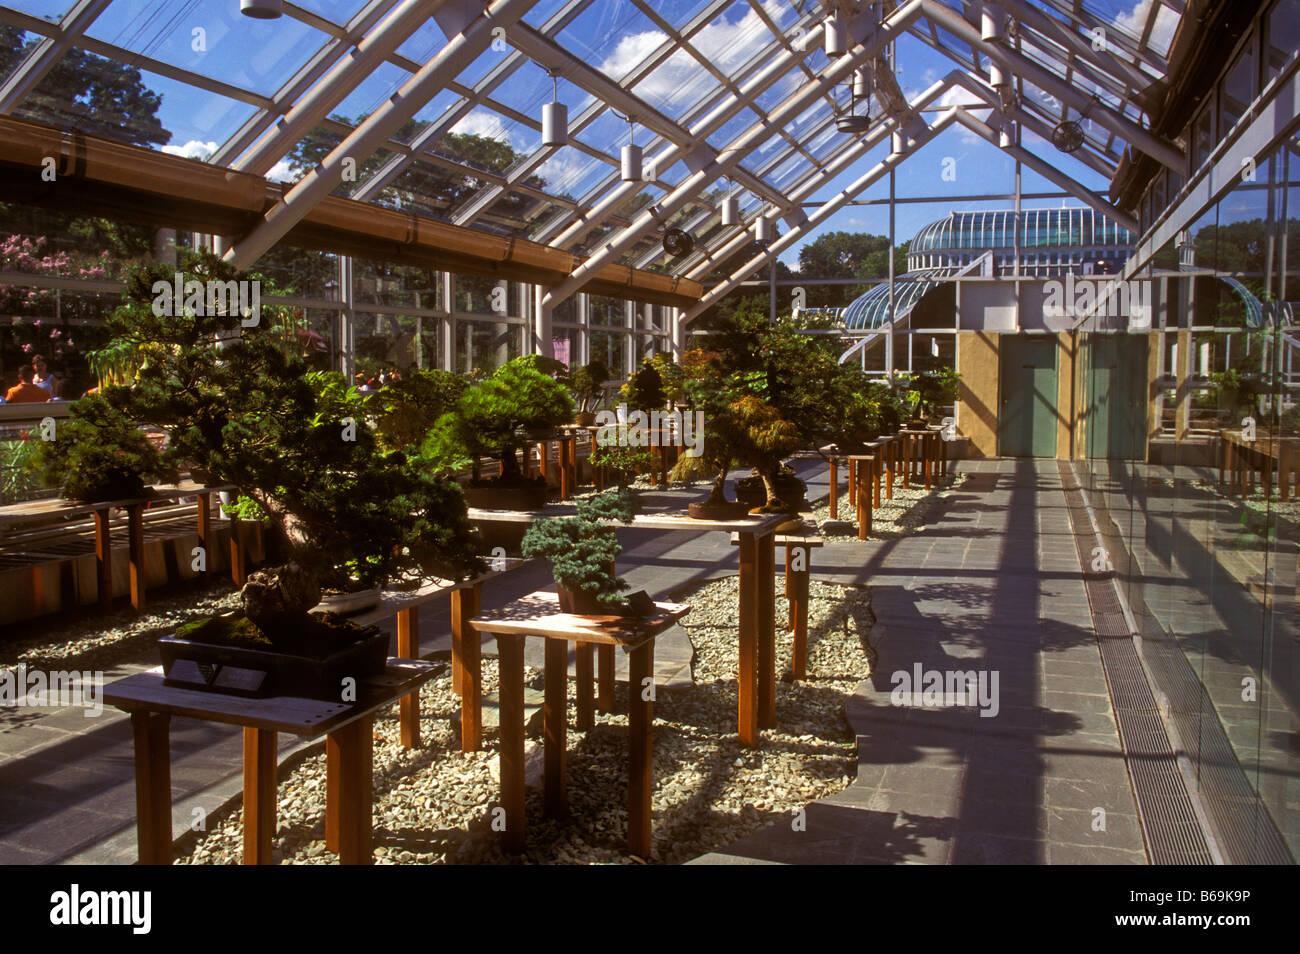 Brooklyn Botanic Garden Building Stock Photos & Brooklyn Botanic ...